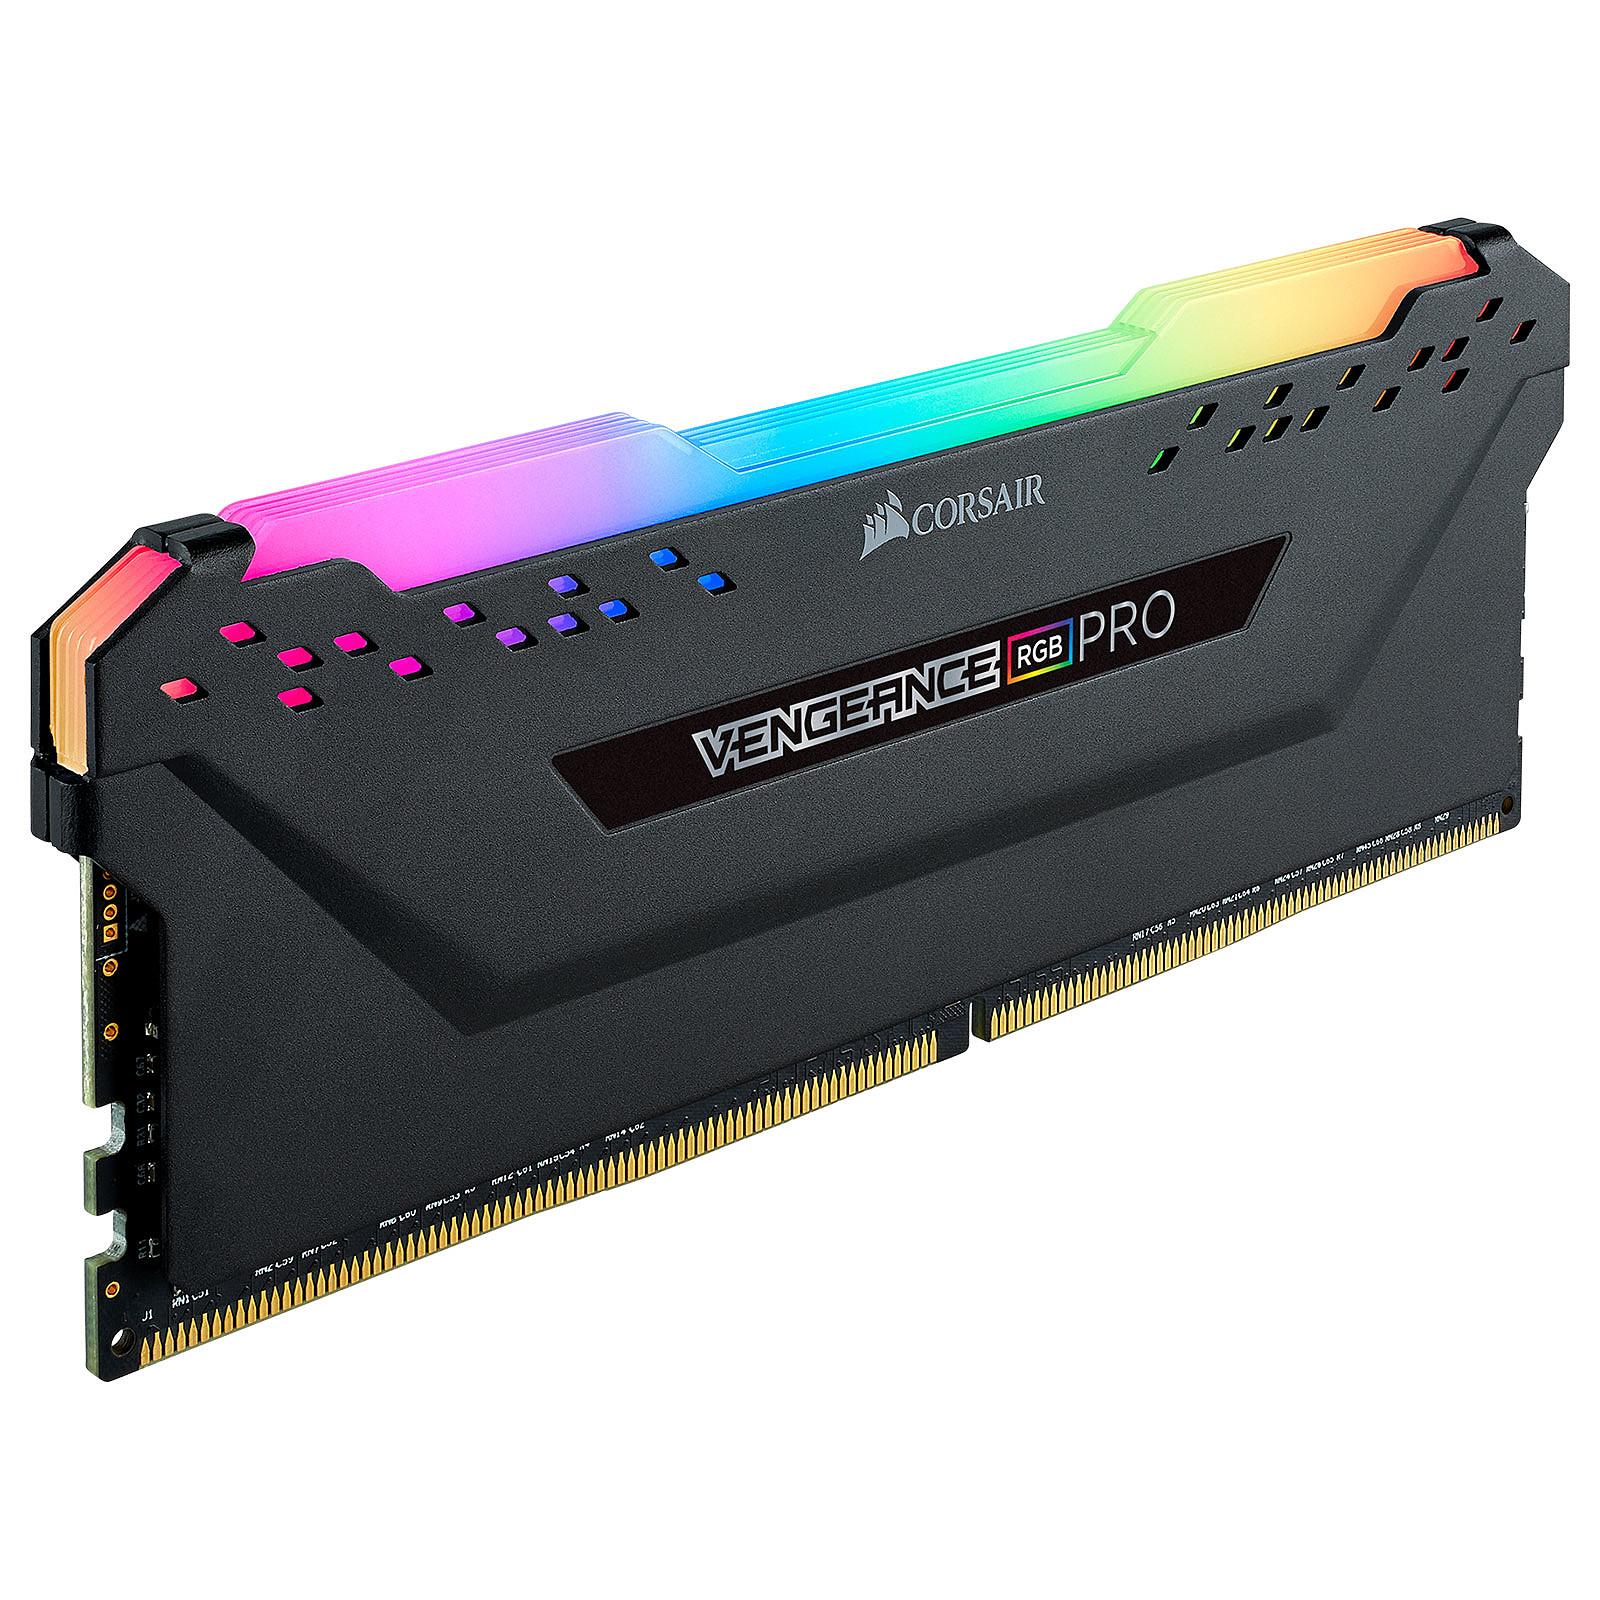 Corsair Vengeance RGB PRO Series 16 GB DDR4 3600 MHz CL18